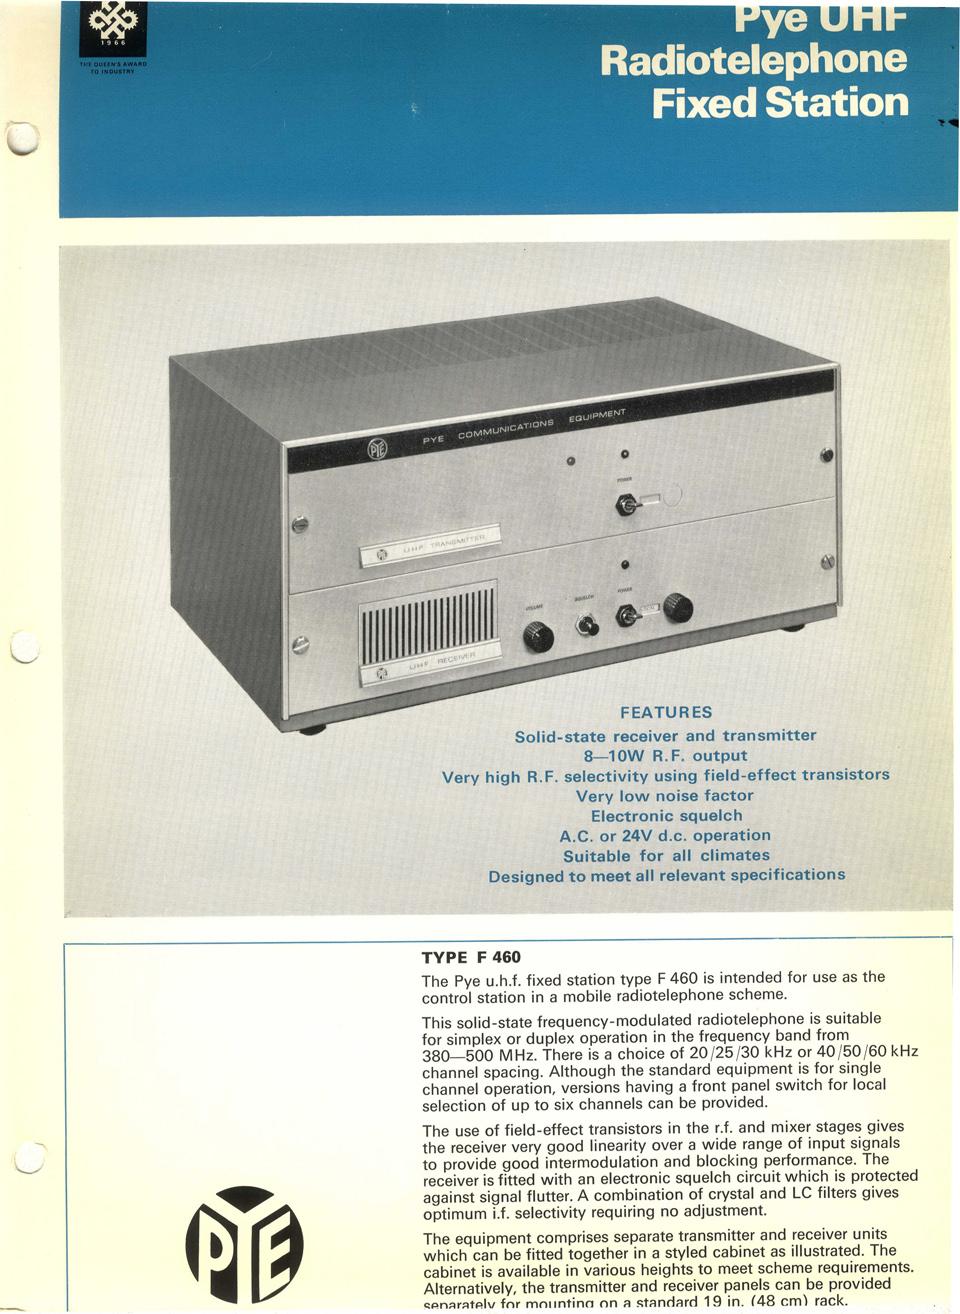 Pye093 100 [ cb radio service manual ] intek m 100 plus radioaficion  at reclaimingppi.co